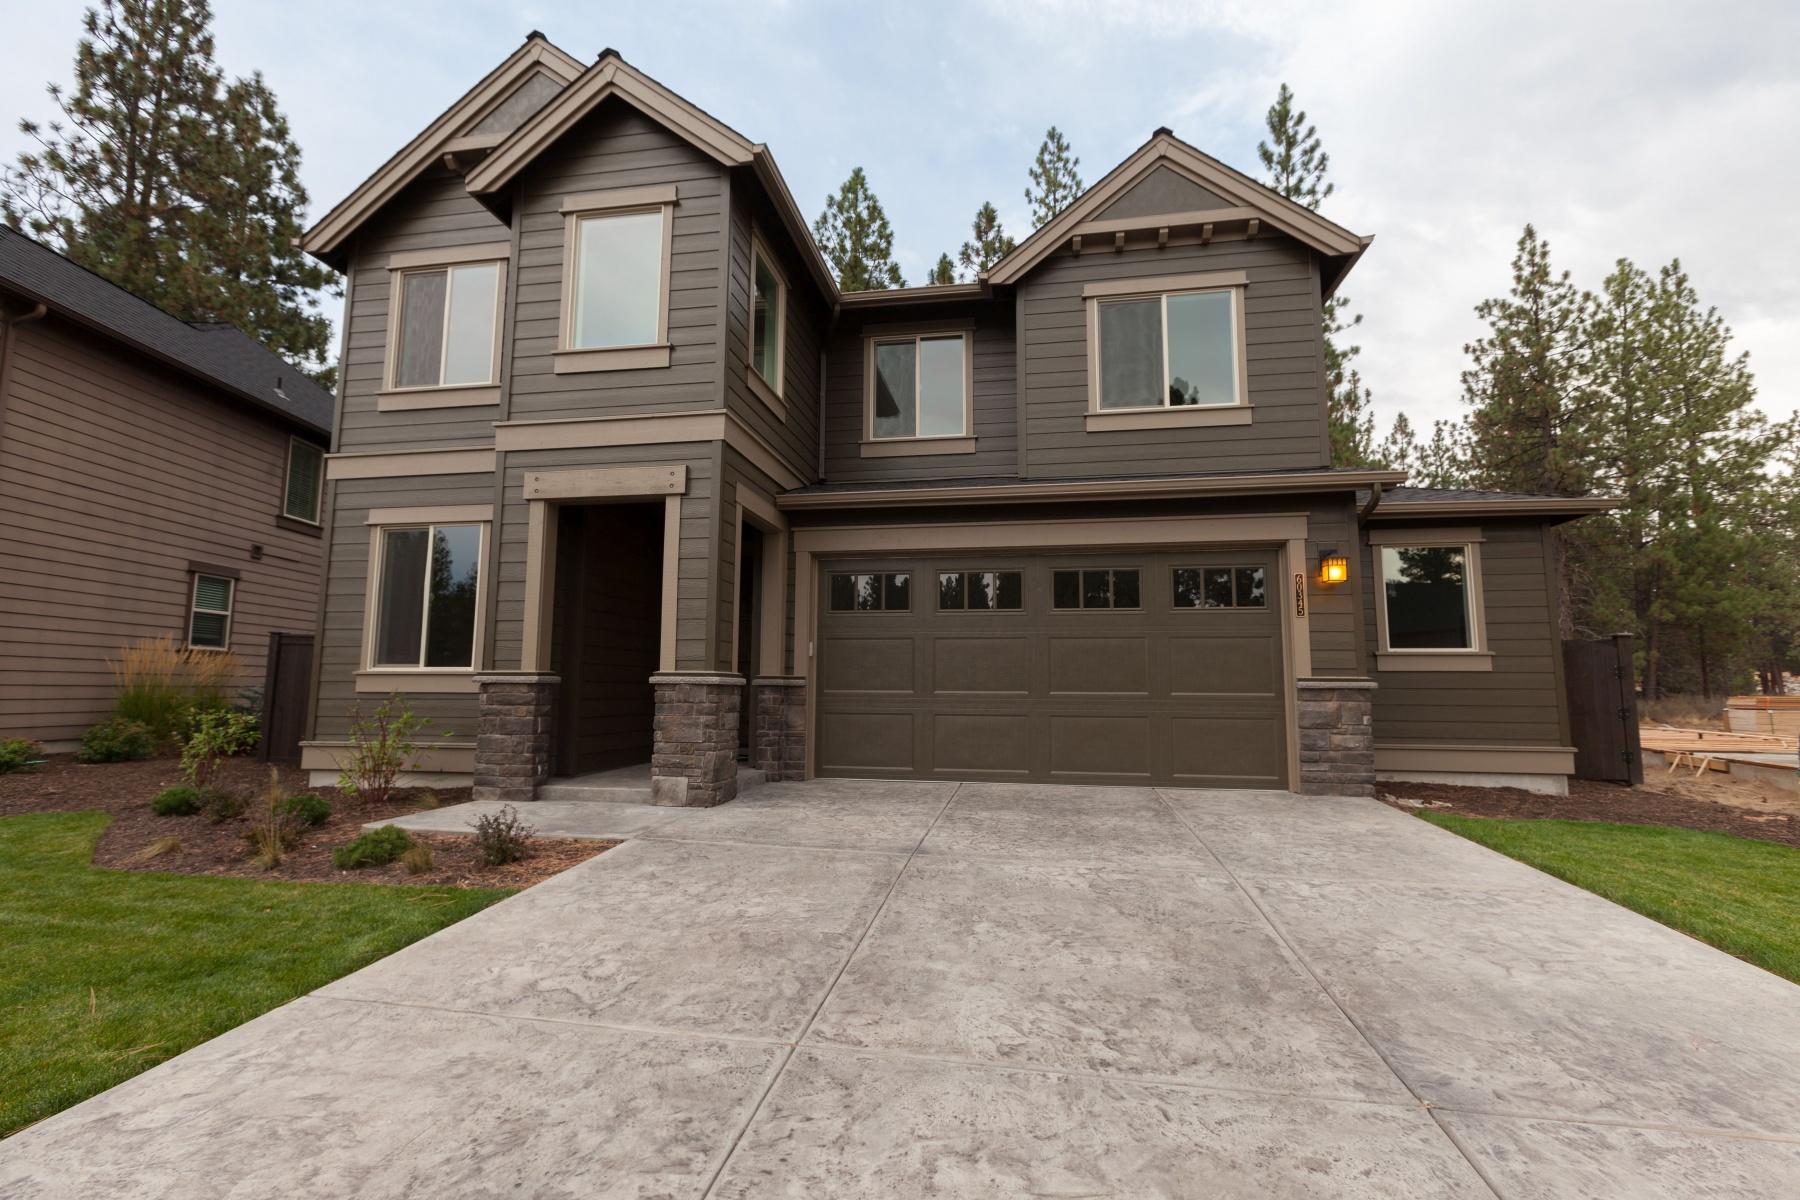 Moradia para Venda às 1243 NE Sunrise Street Lot 79, PRINEVILLE 1243 NE Sunrise St Lot 79 Prineville, Oregon, 97754 Estados Unidos